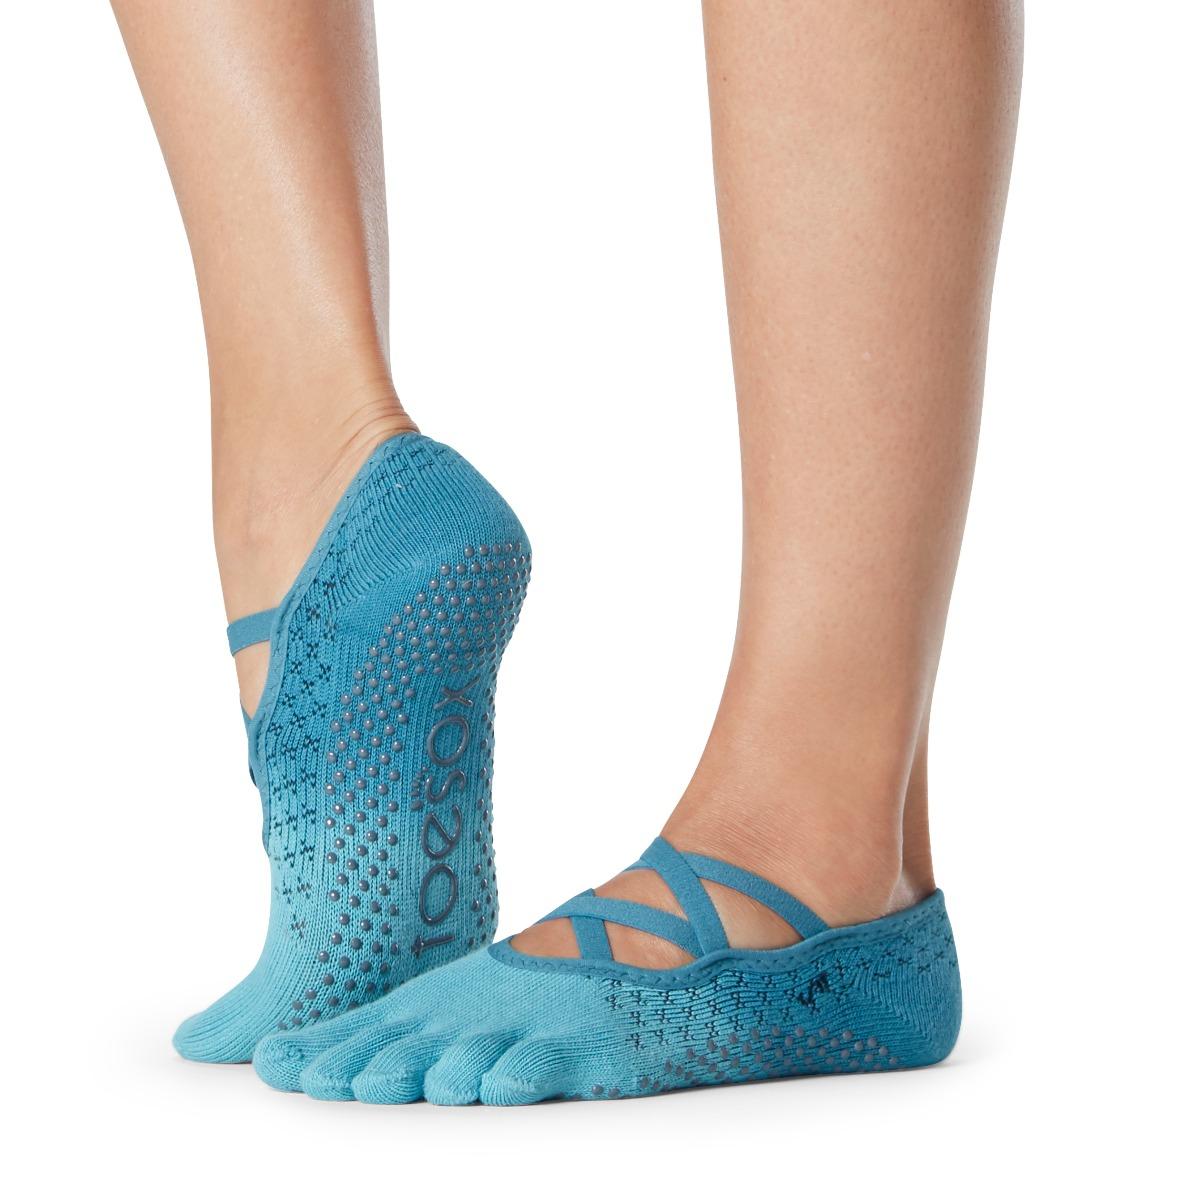 Yogasocken ToeSox Elle Full Toe Glacial